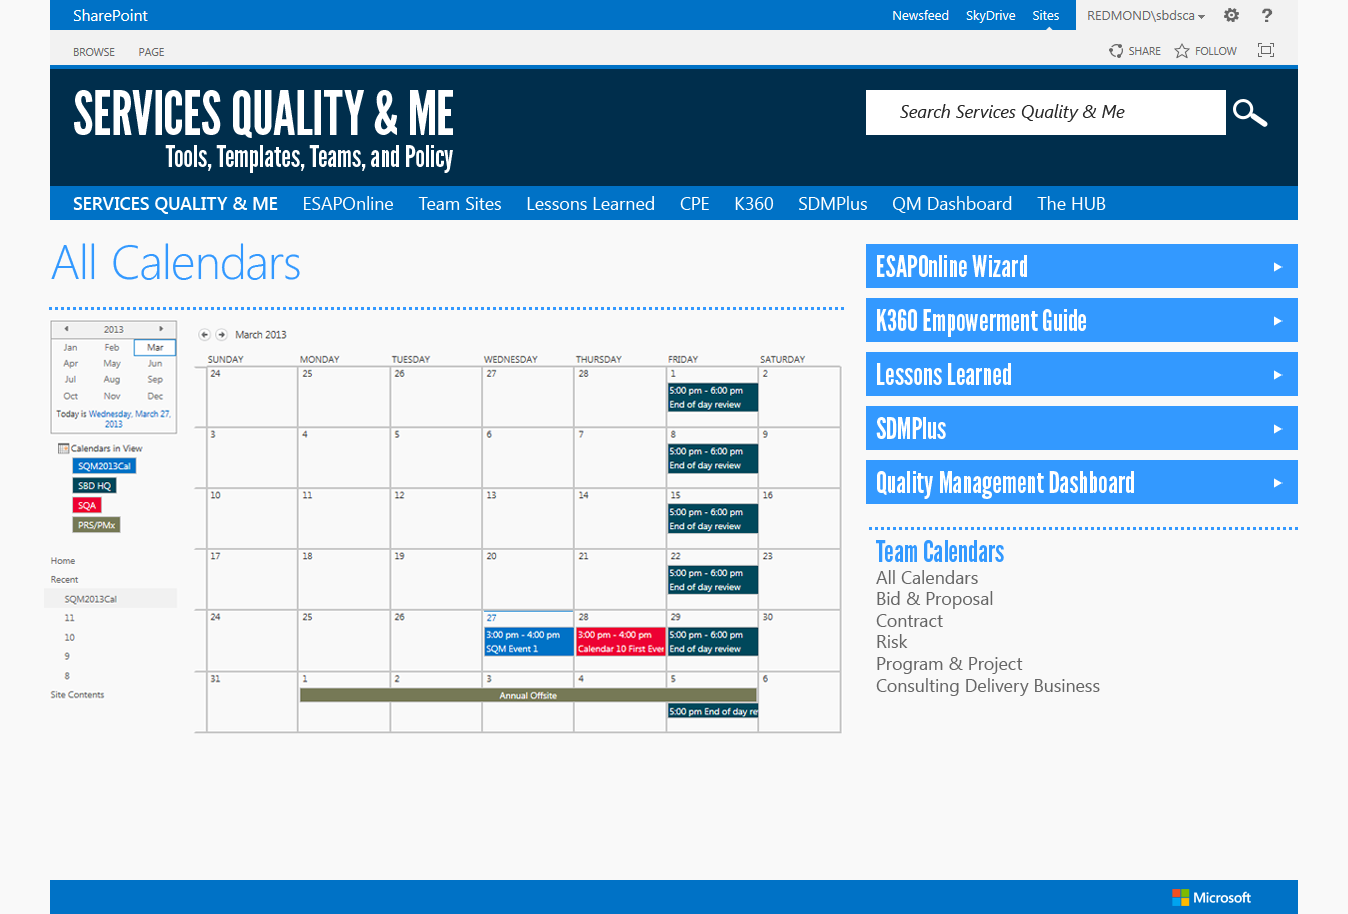 SQM Team Calendars